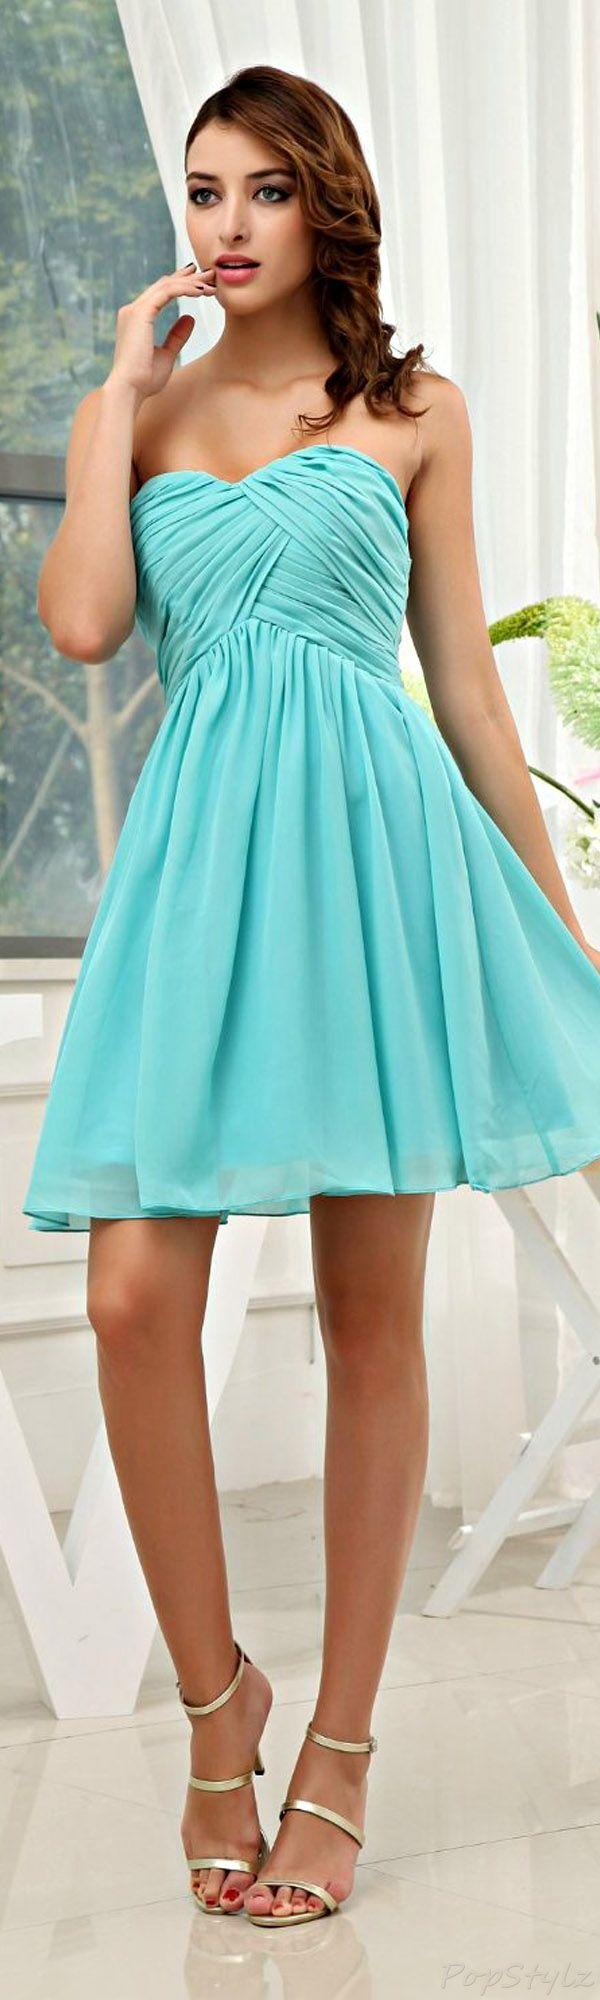 Fancy Tween Bridesmaid Dresses Collection - All Wedding Dresses ...